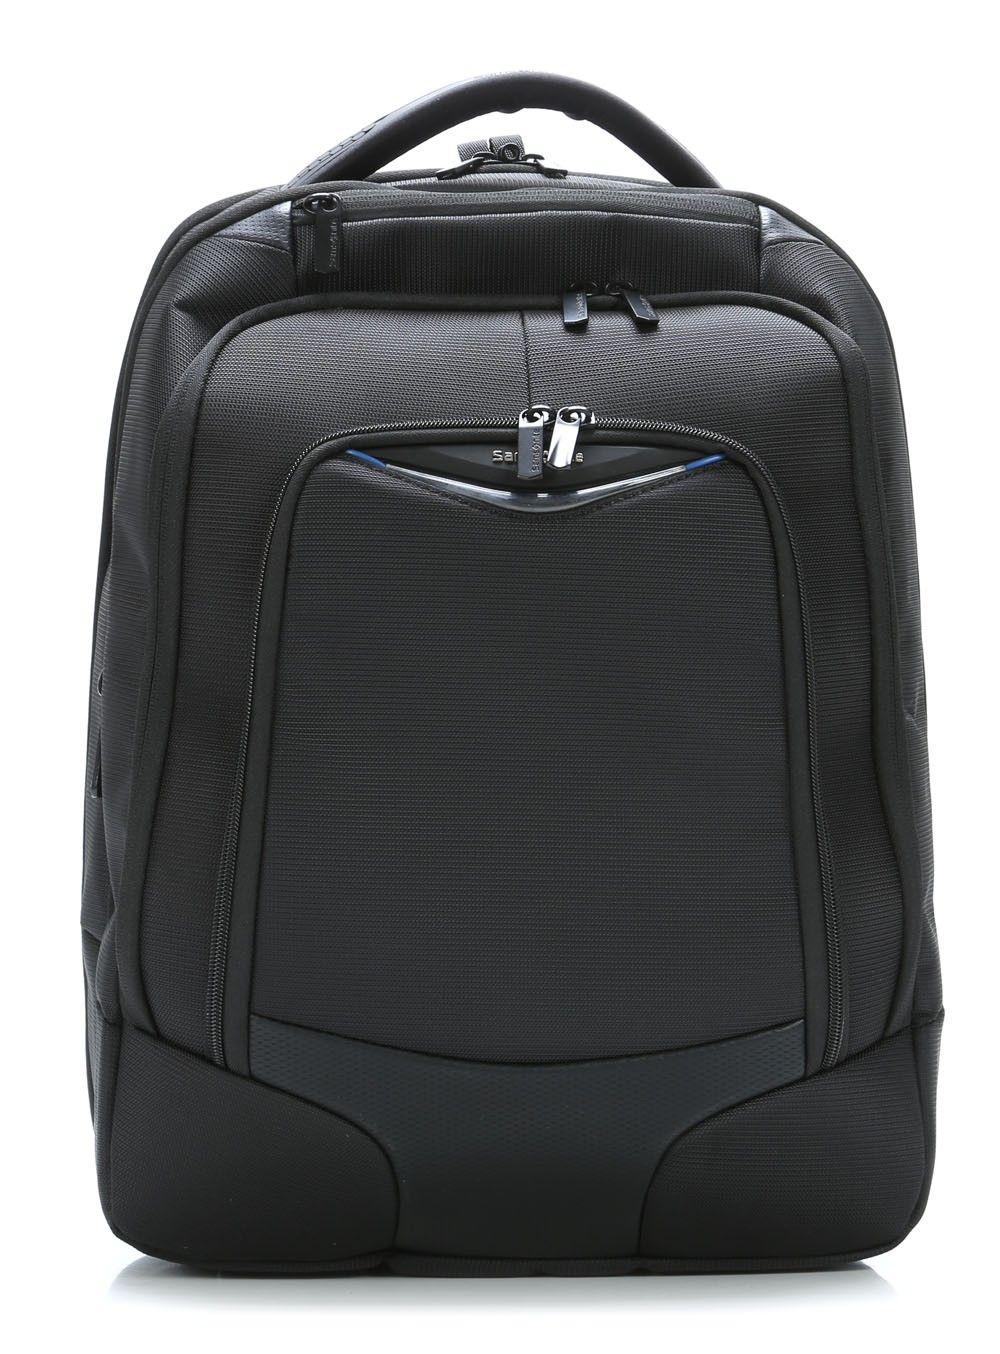 buy online e5583 14ee5 Triforce 15'' Laptop-Rucksack schwarz 46 cm | shop ...